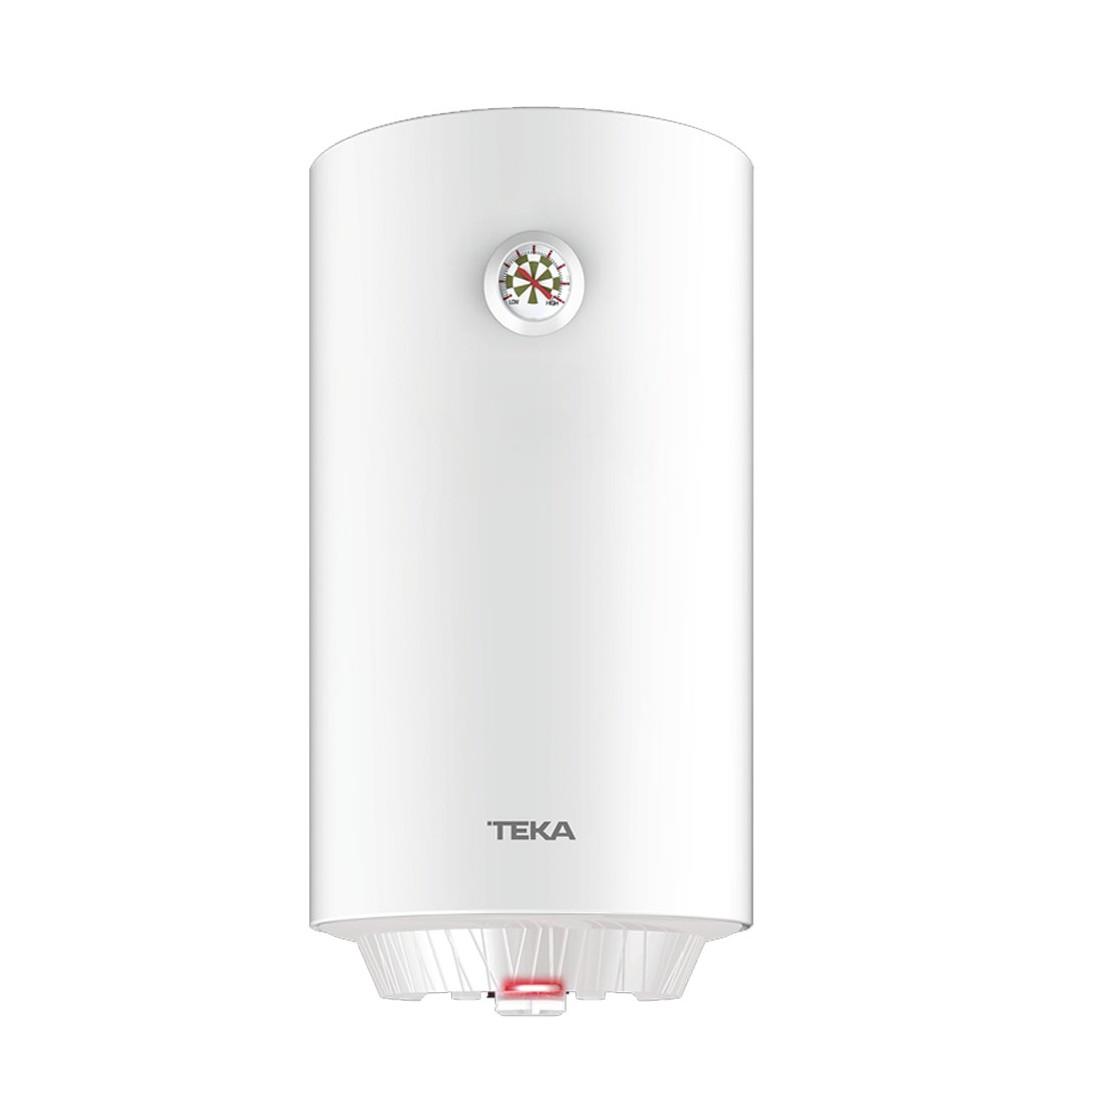 Termo - Teka EWH 50 C, Blanco, 50L